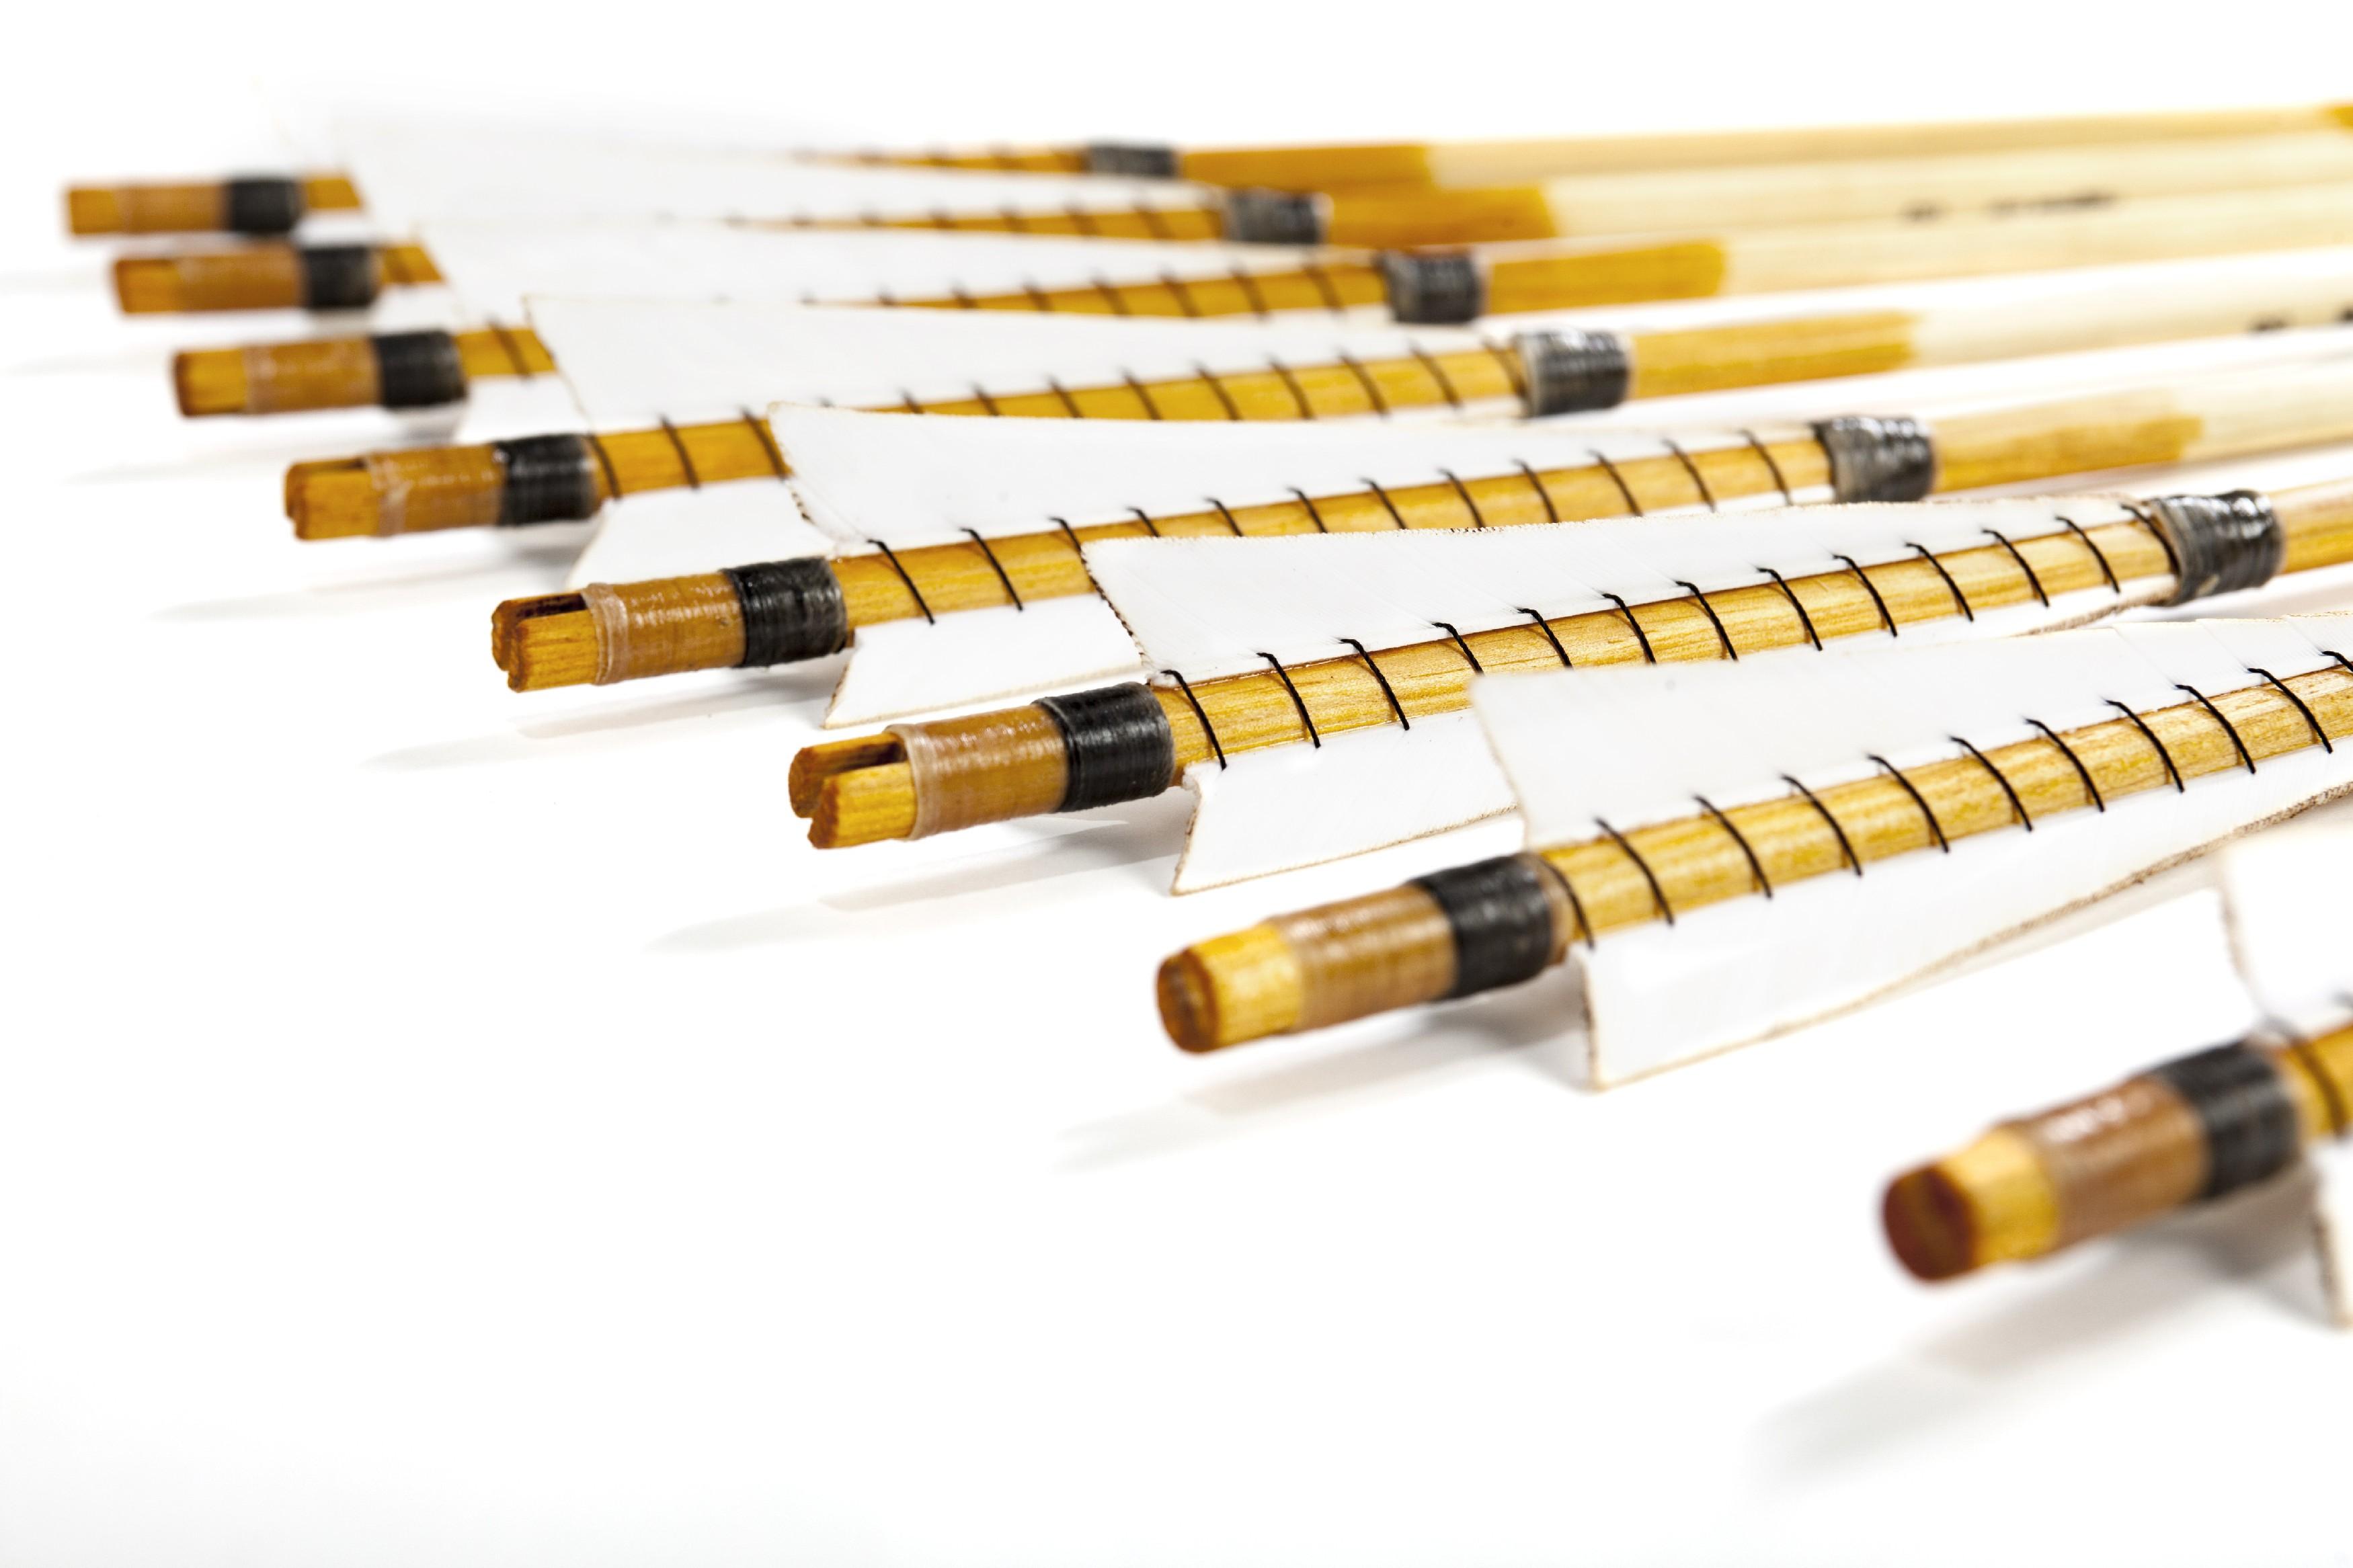 koezepkori-longbow-nyilvesszo-1